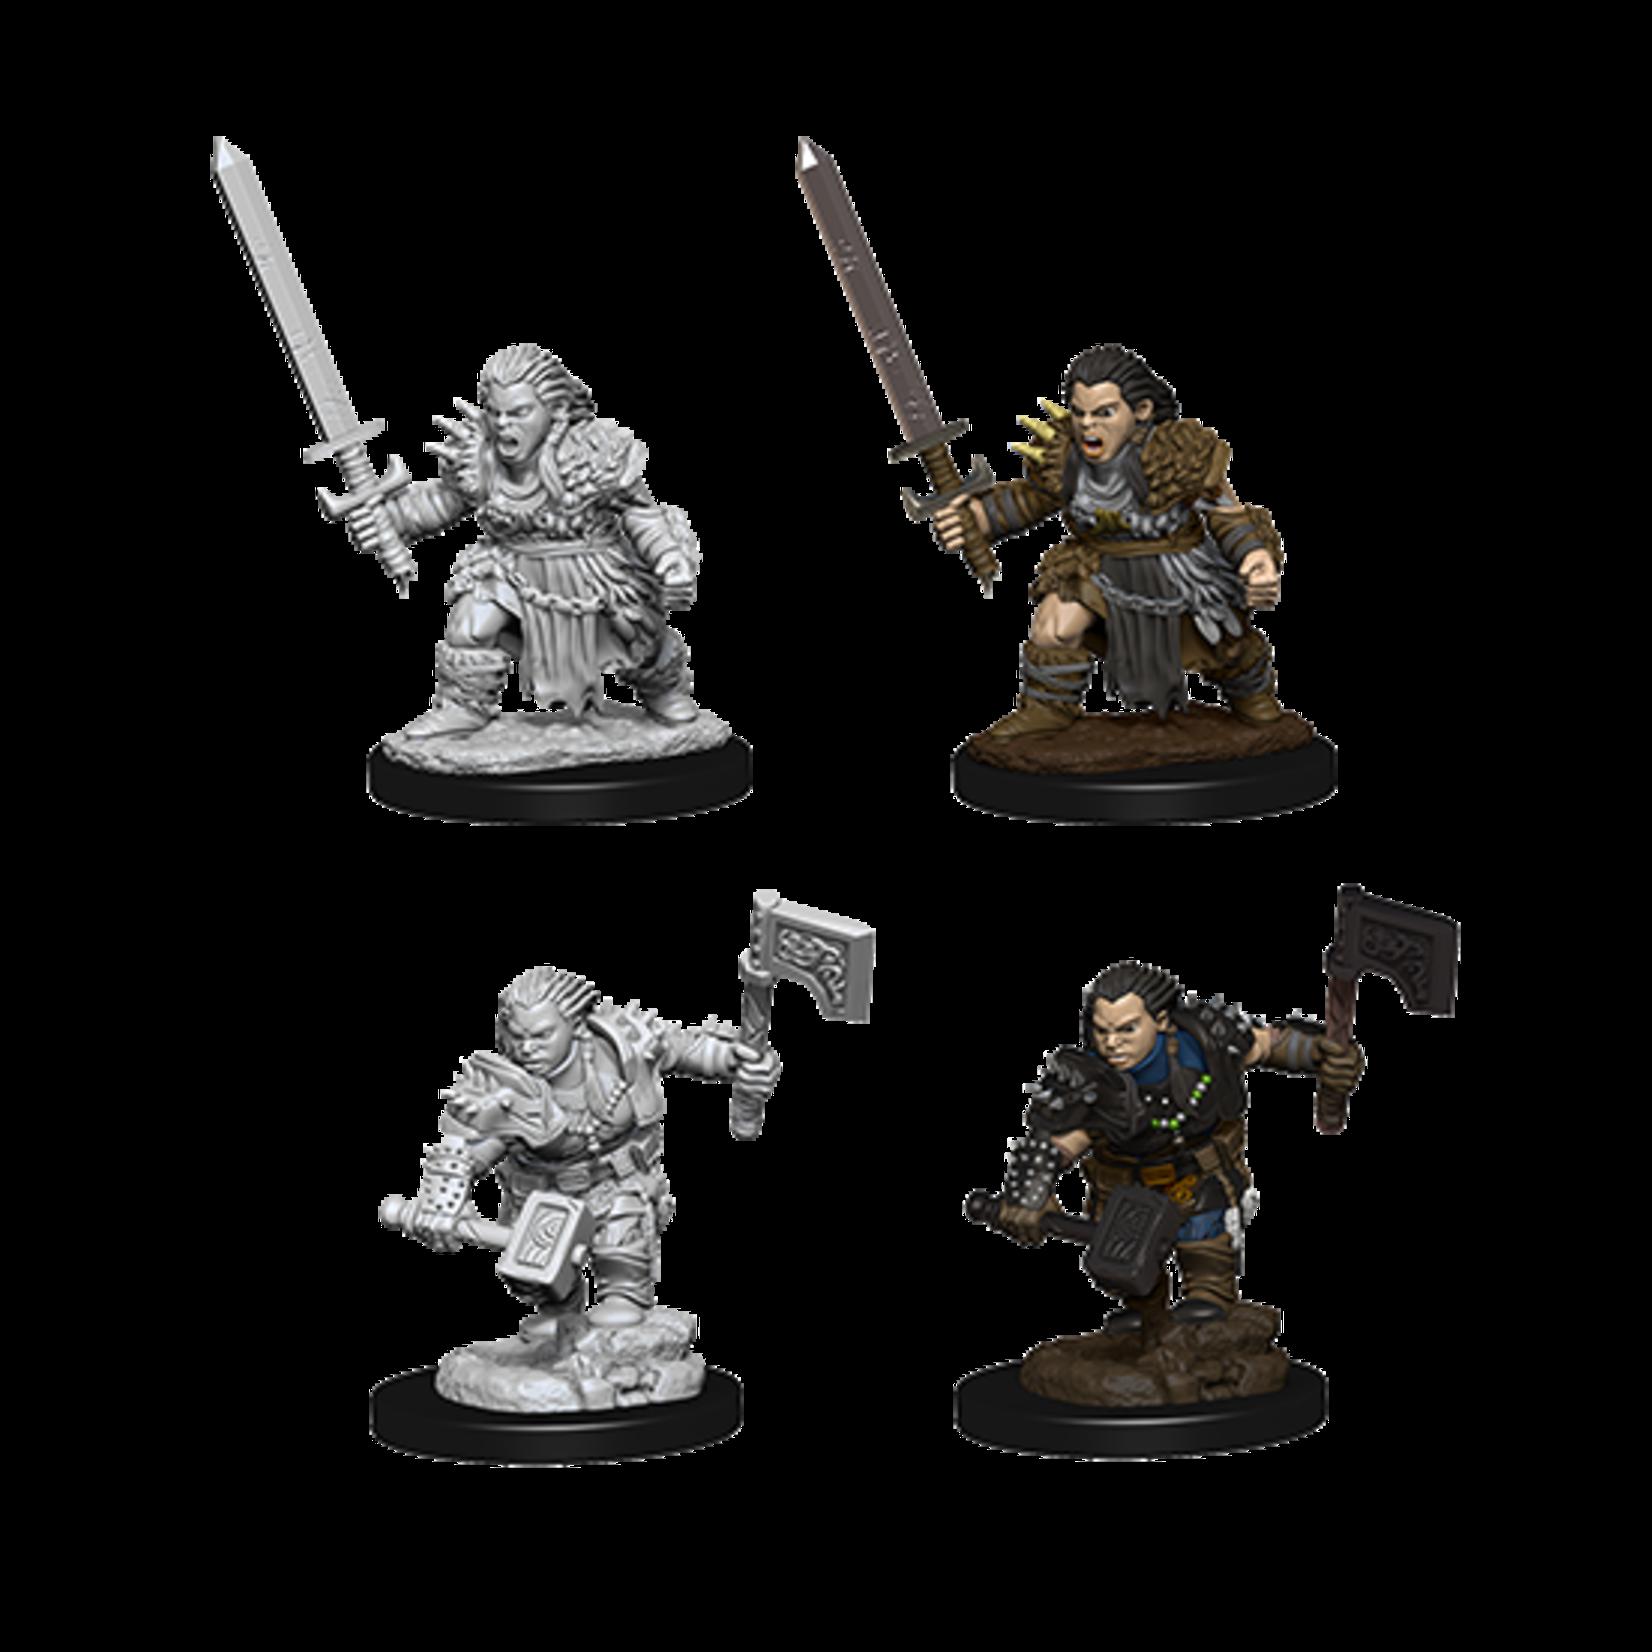 WizKids Pathfinder Battles Deep Cuts Unpainted Miniatures: Dwarf Female Barbarian (W8)